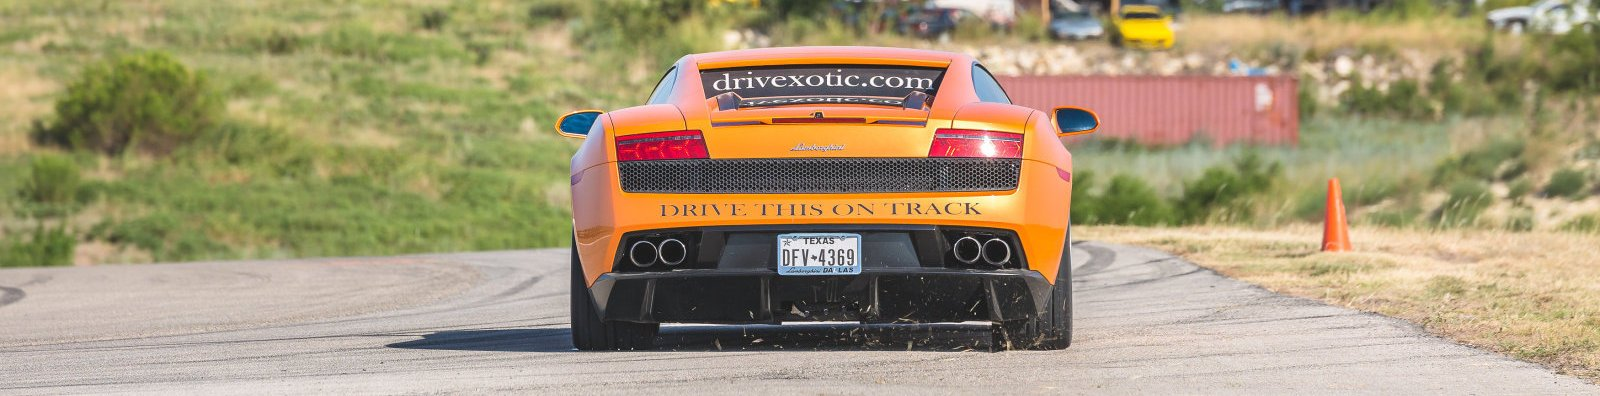 Race Car Driving Experience Dallas